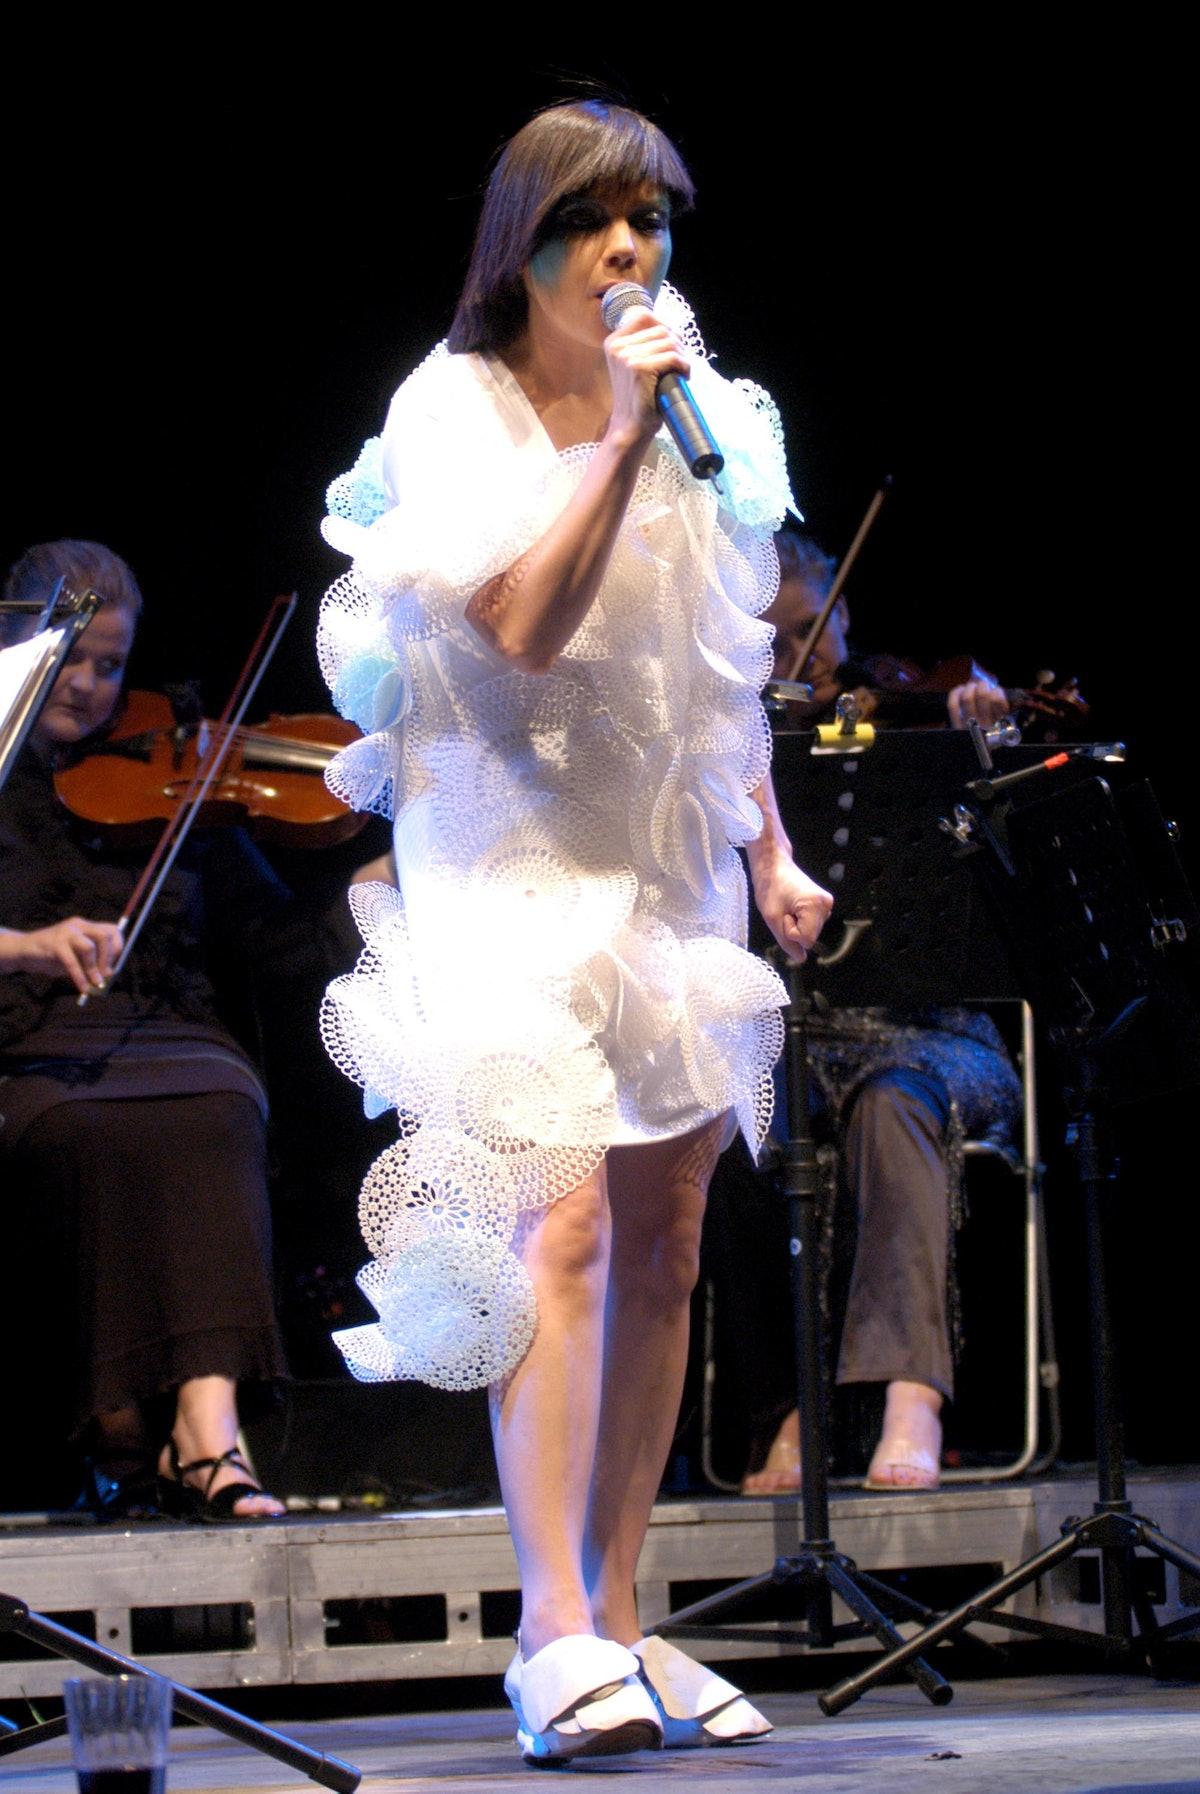 Bjork in Concert at Coney Island - August 23, 2003